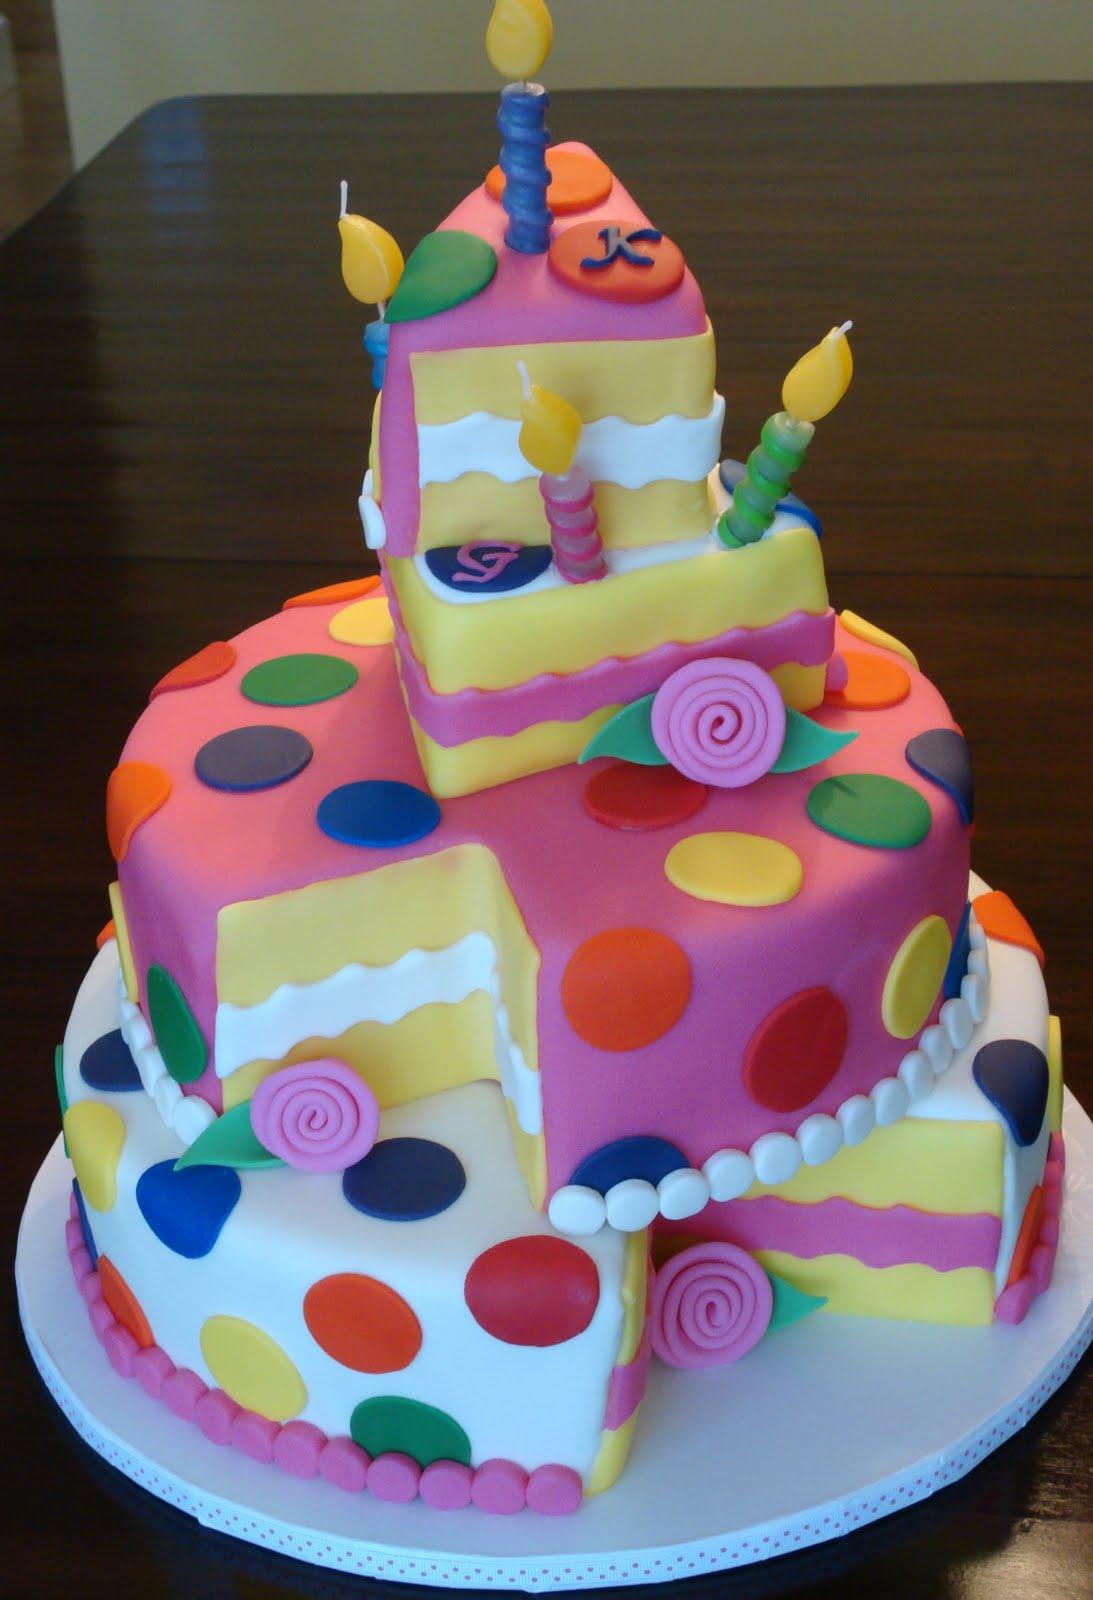 Cake Designs With Polka Dots : Debby s Cakes: Topsy Turvy Polka Dot Birthday